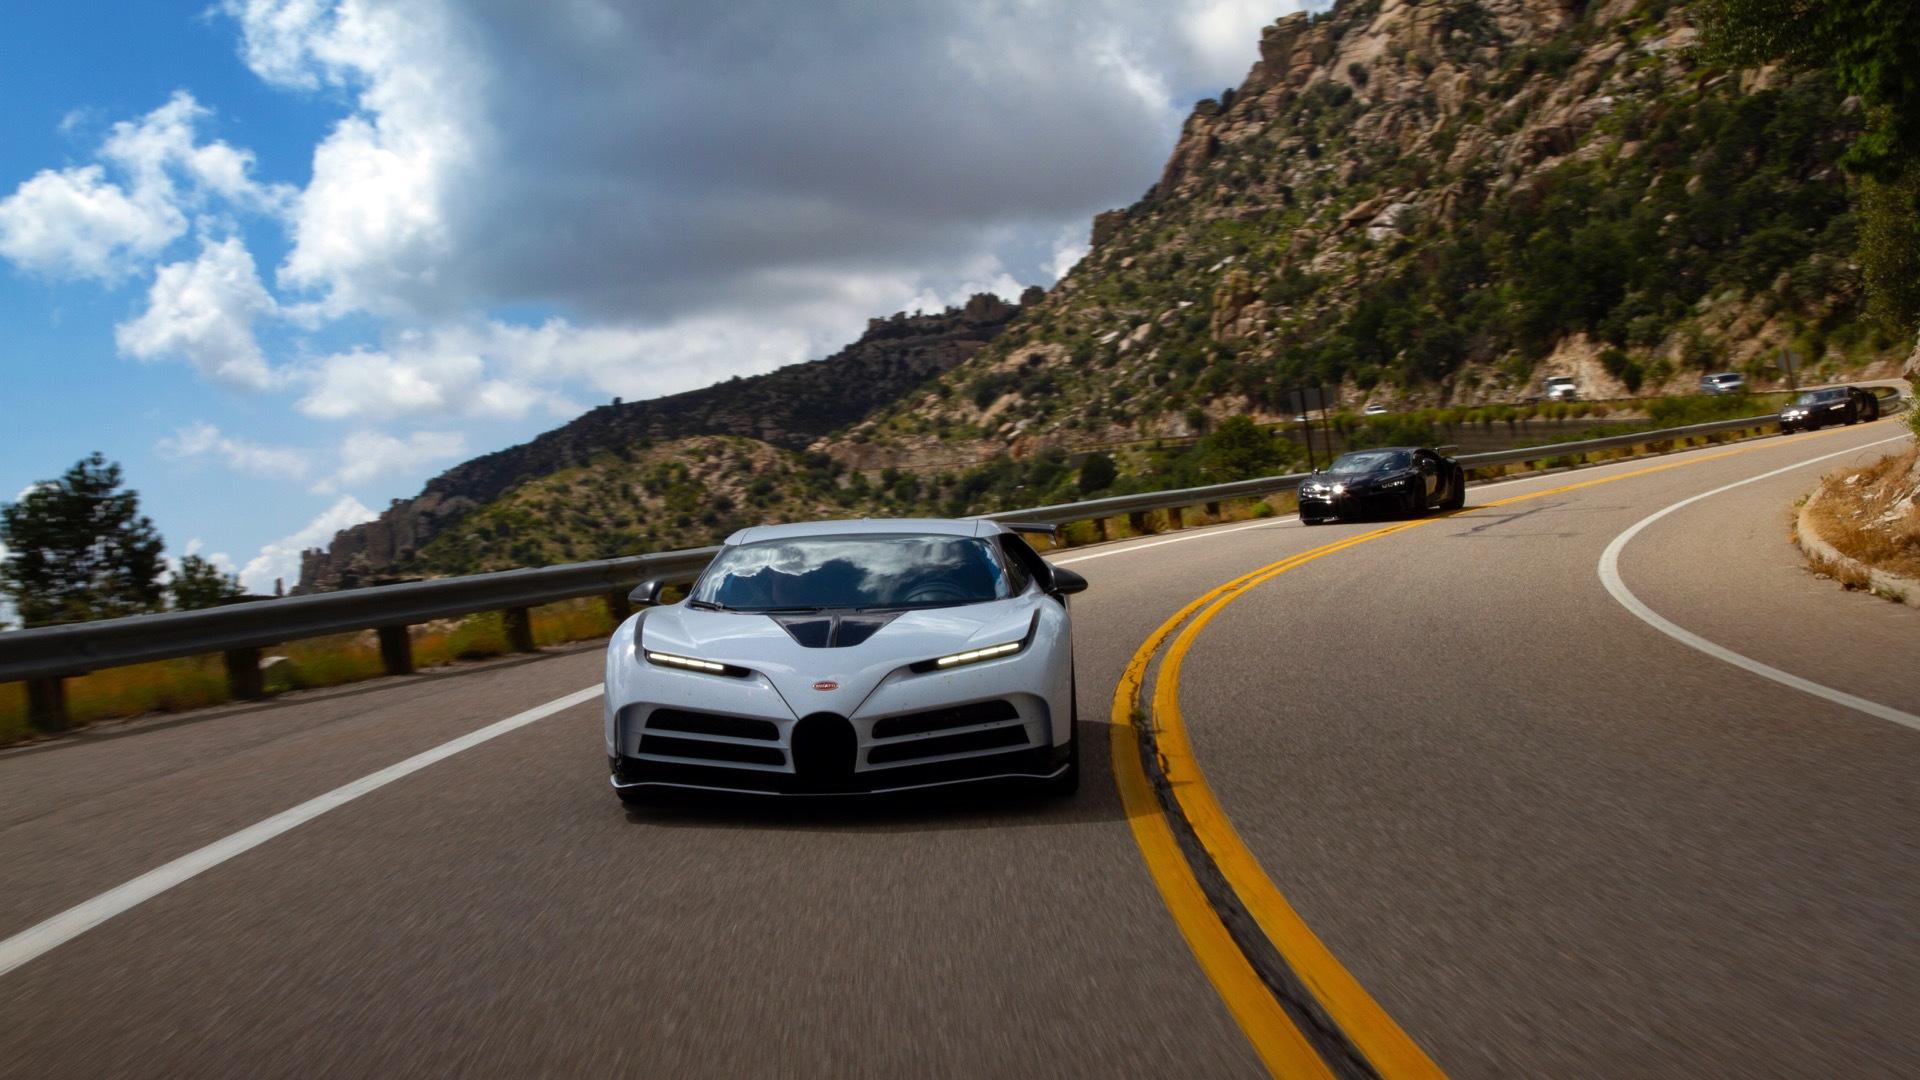 Bugatti hot weather testing